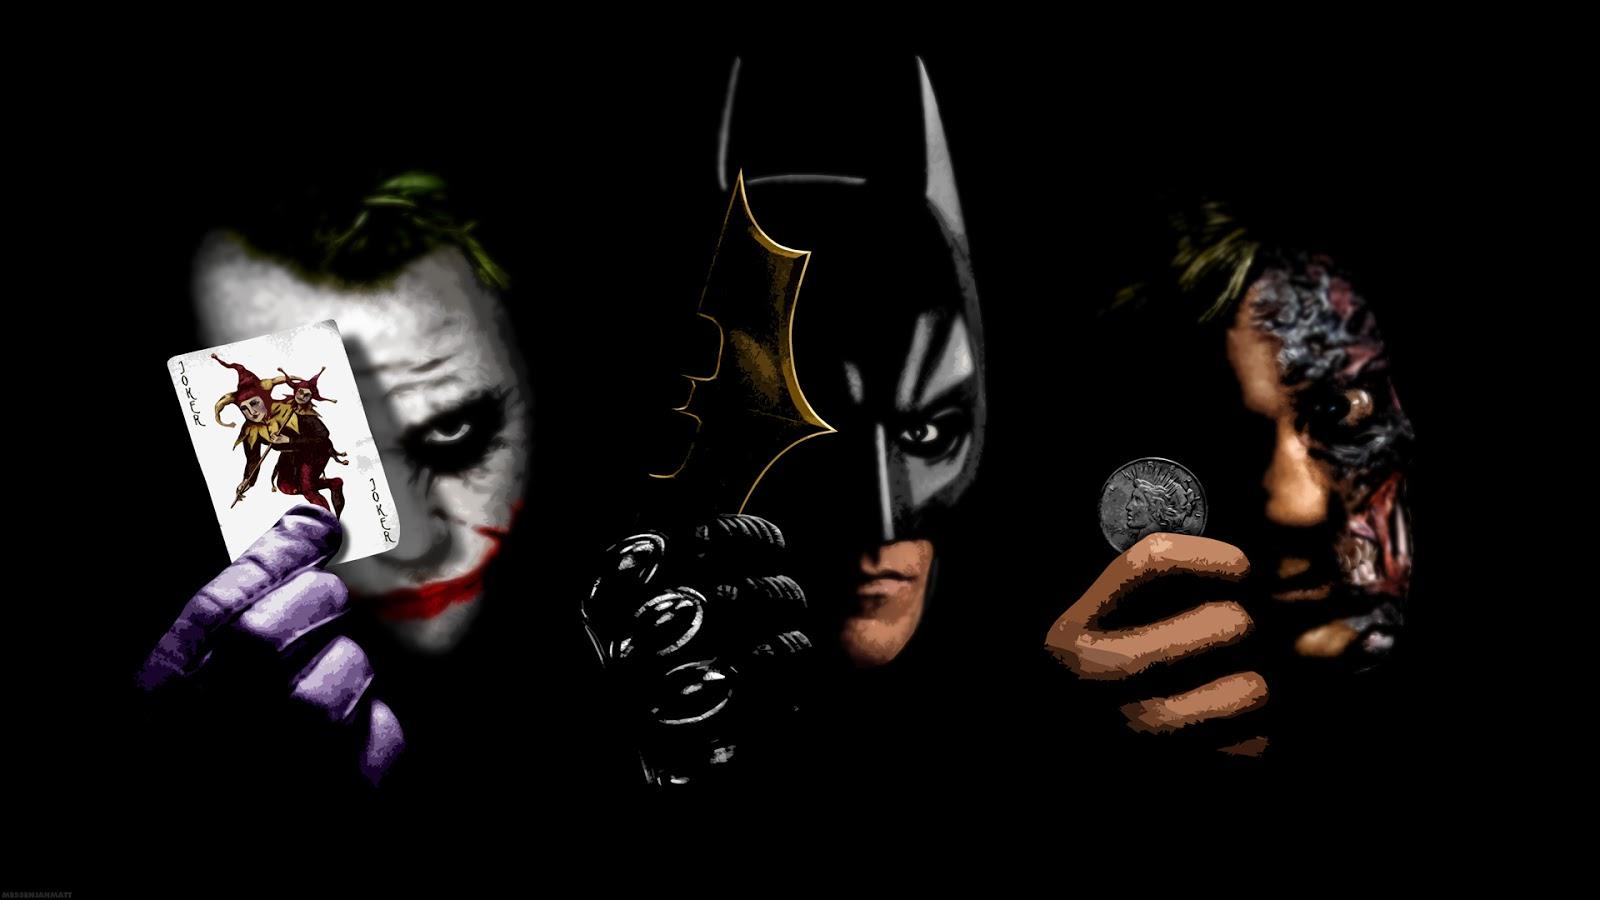 Download Gambar Joker Kartu Remi